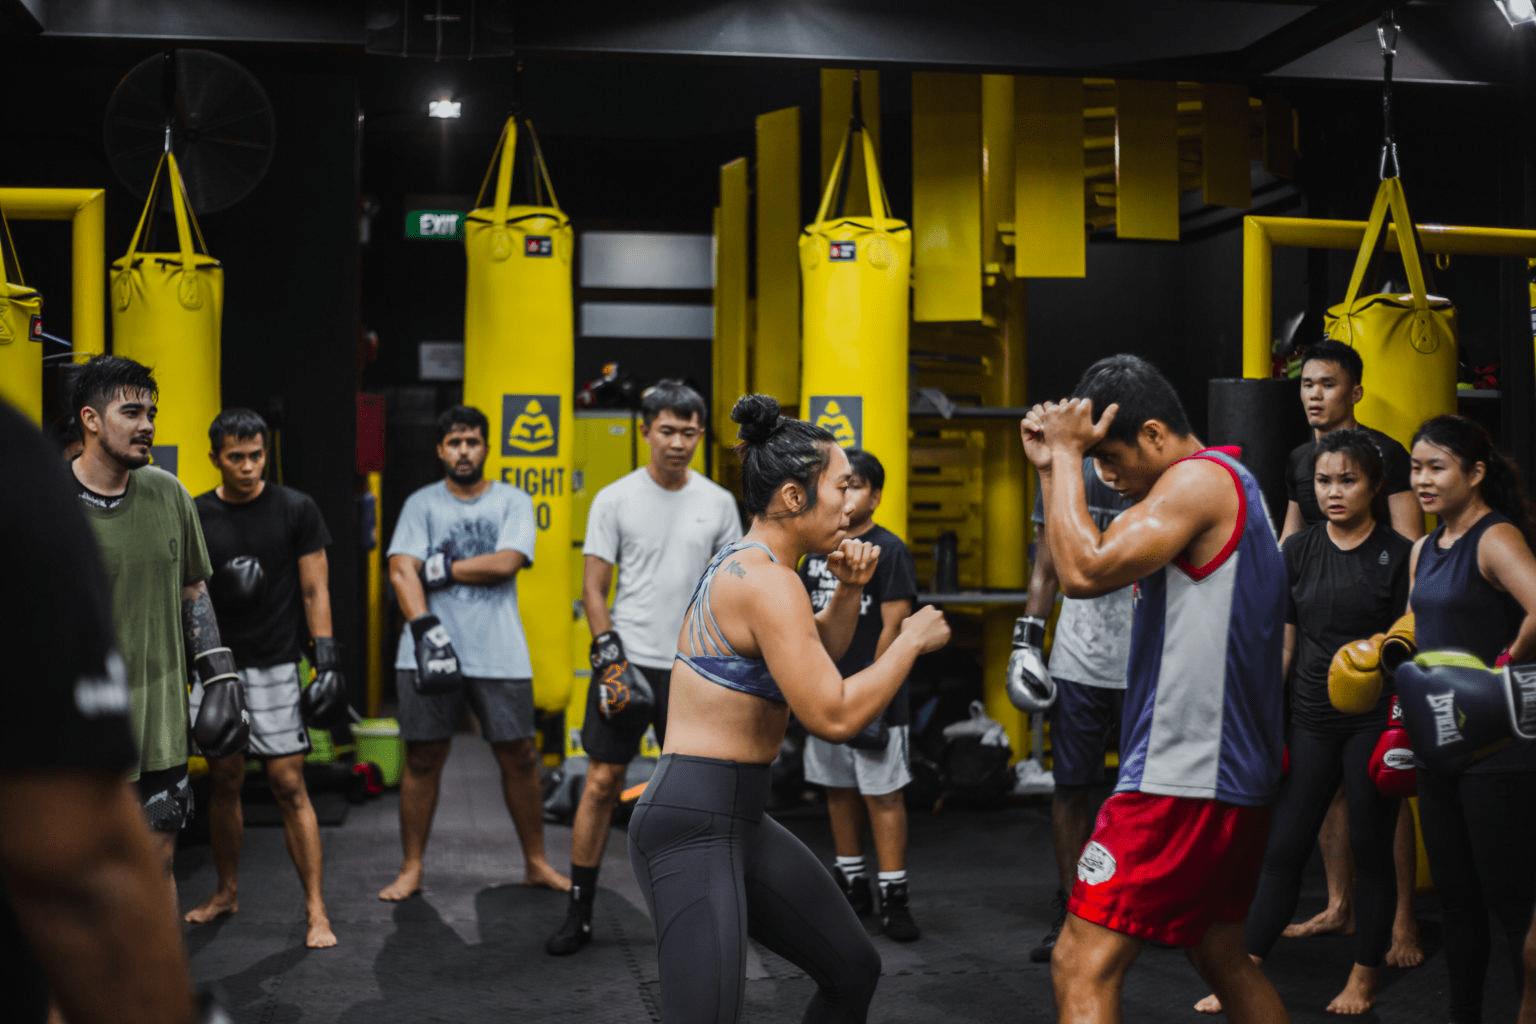 boxing gyms - juggernaut fight club